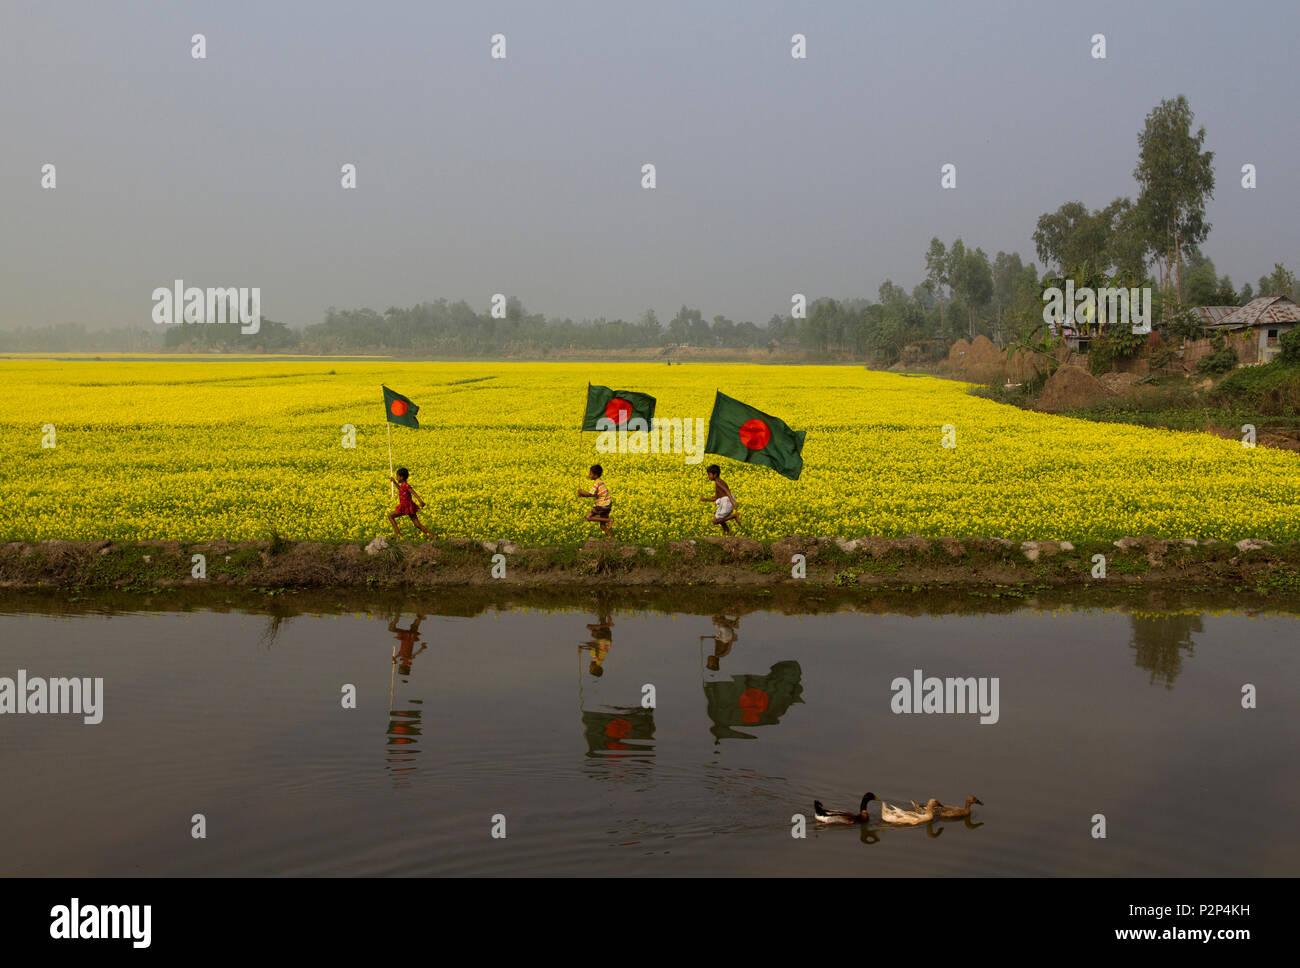 Bangladeshi rural children run with Bangladeshi national flag through a mustard field at Chalan Beel in Natore. Bangladesh. - Stock Image